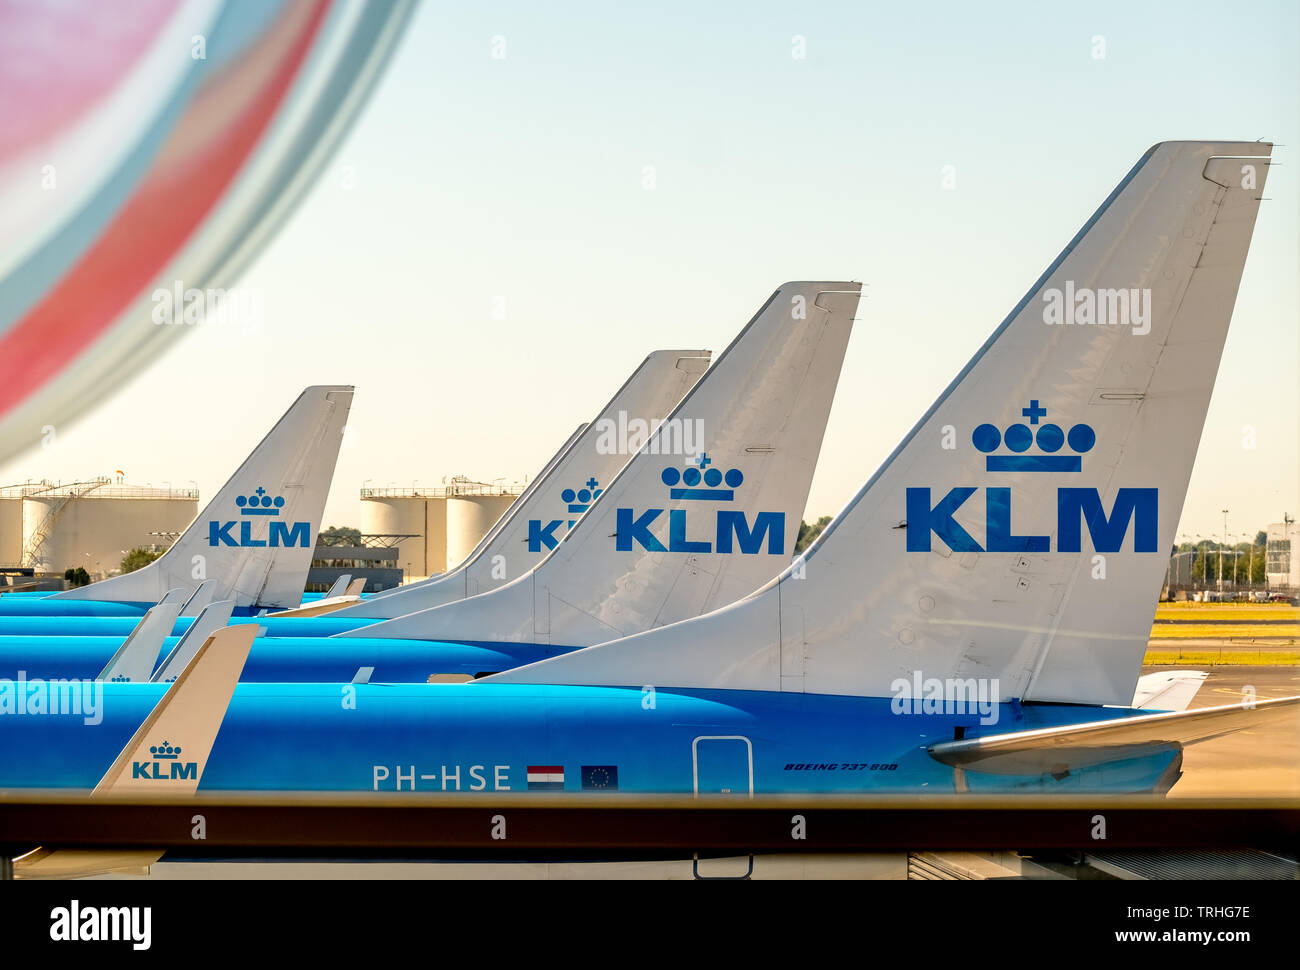 KLM tailplane at Amsterdam Schiphol Airport, Noord-Holland, Netherlands, Europe, Schiphol, NLD, Travel, Tourism, Travel Destination, Sightseeing, Sea - Stock Image